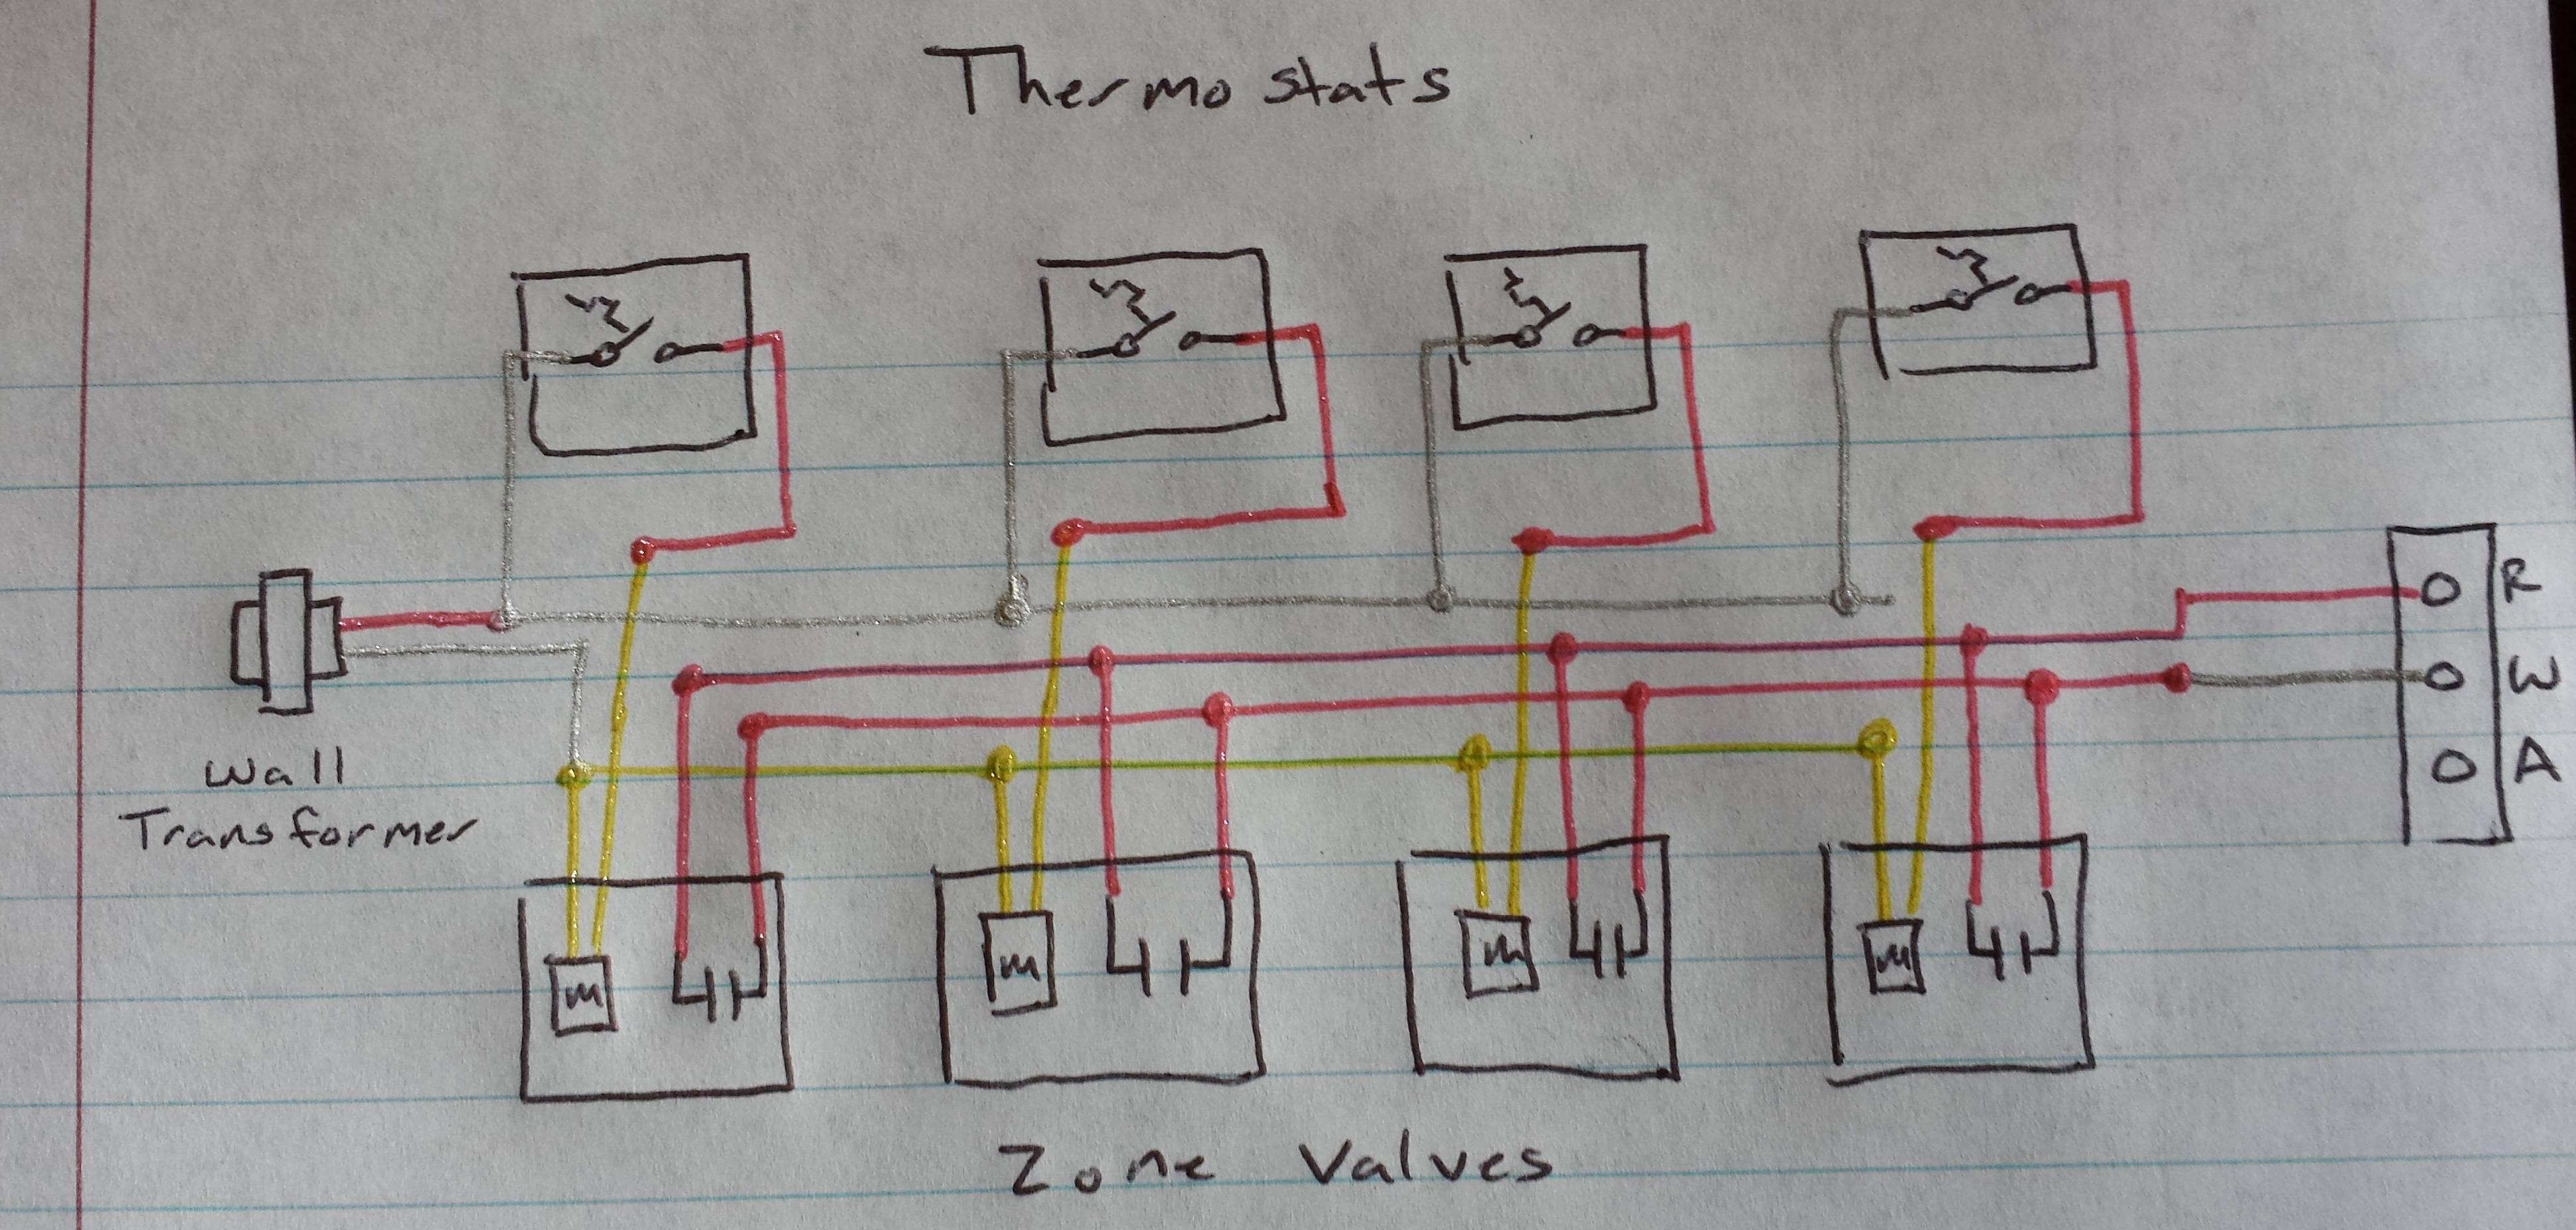 24 volt heat only thermostat wiring diagram